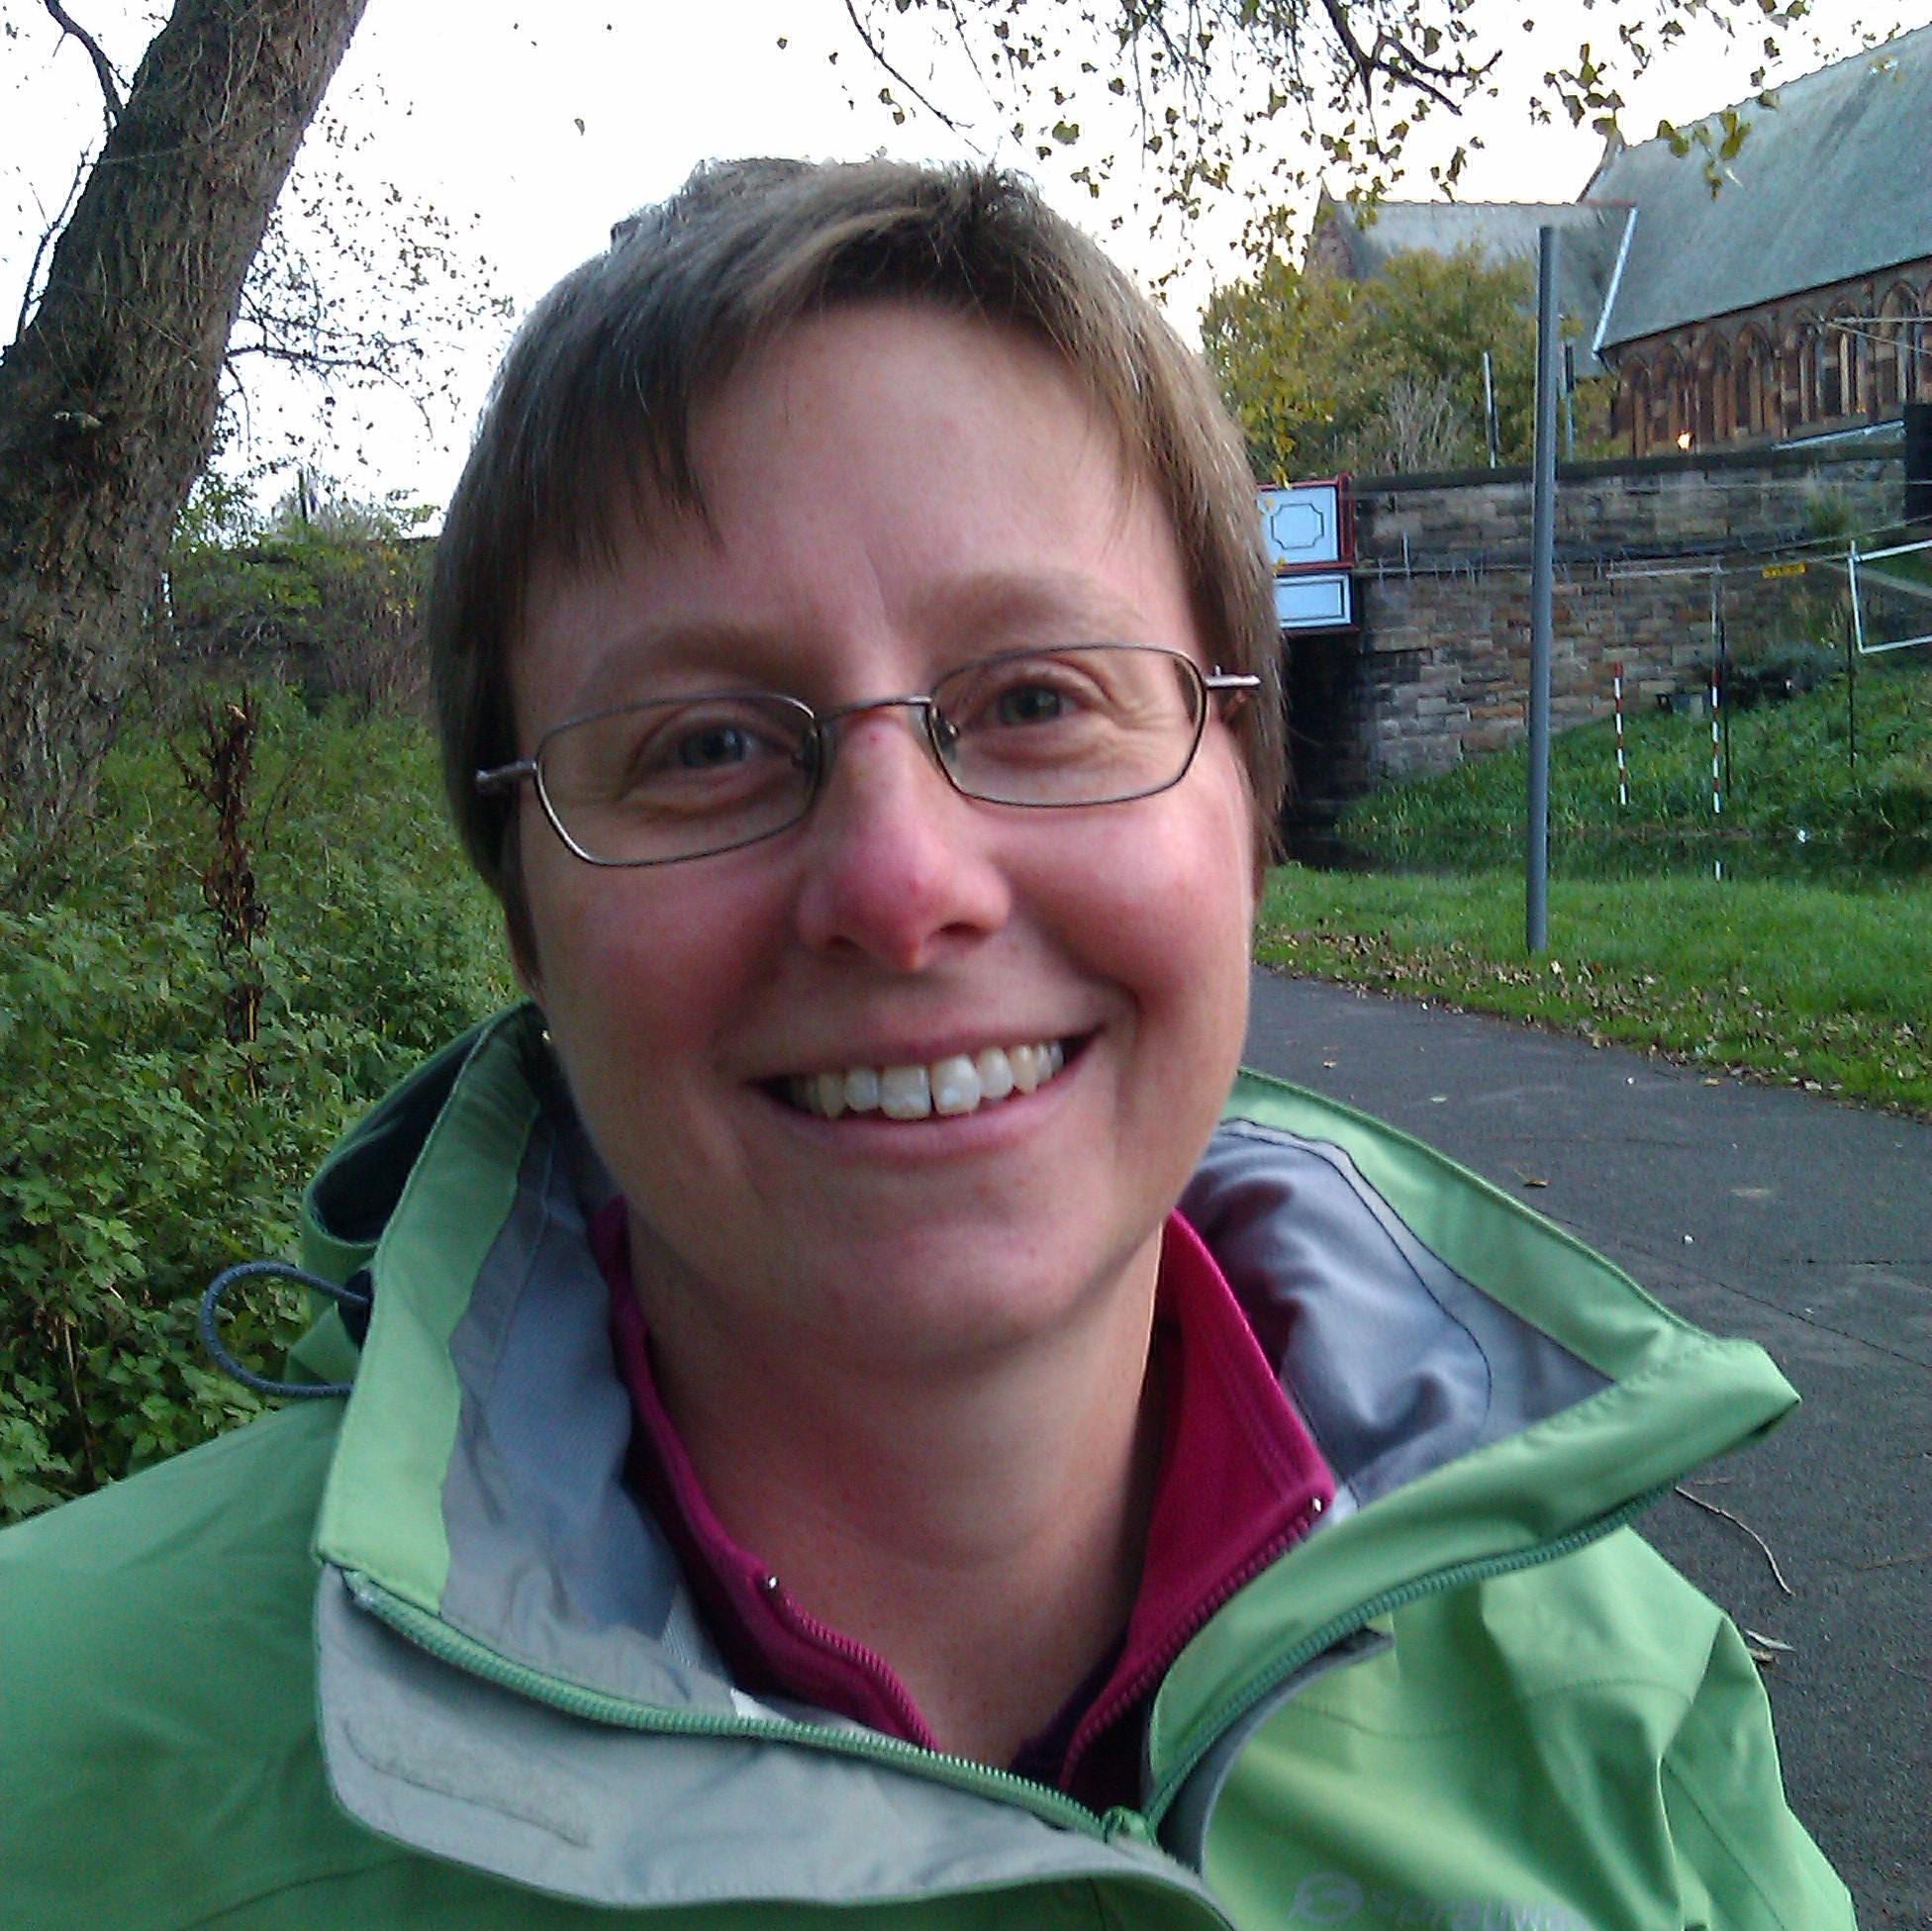 Jessica Brown (St. Andrews)